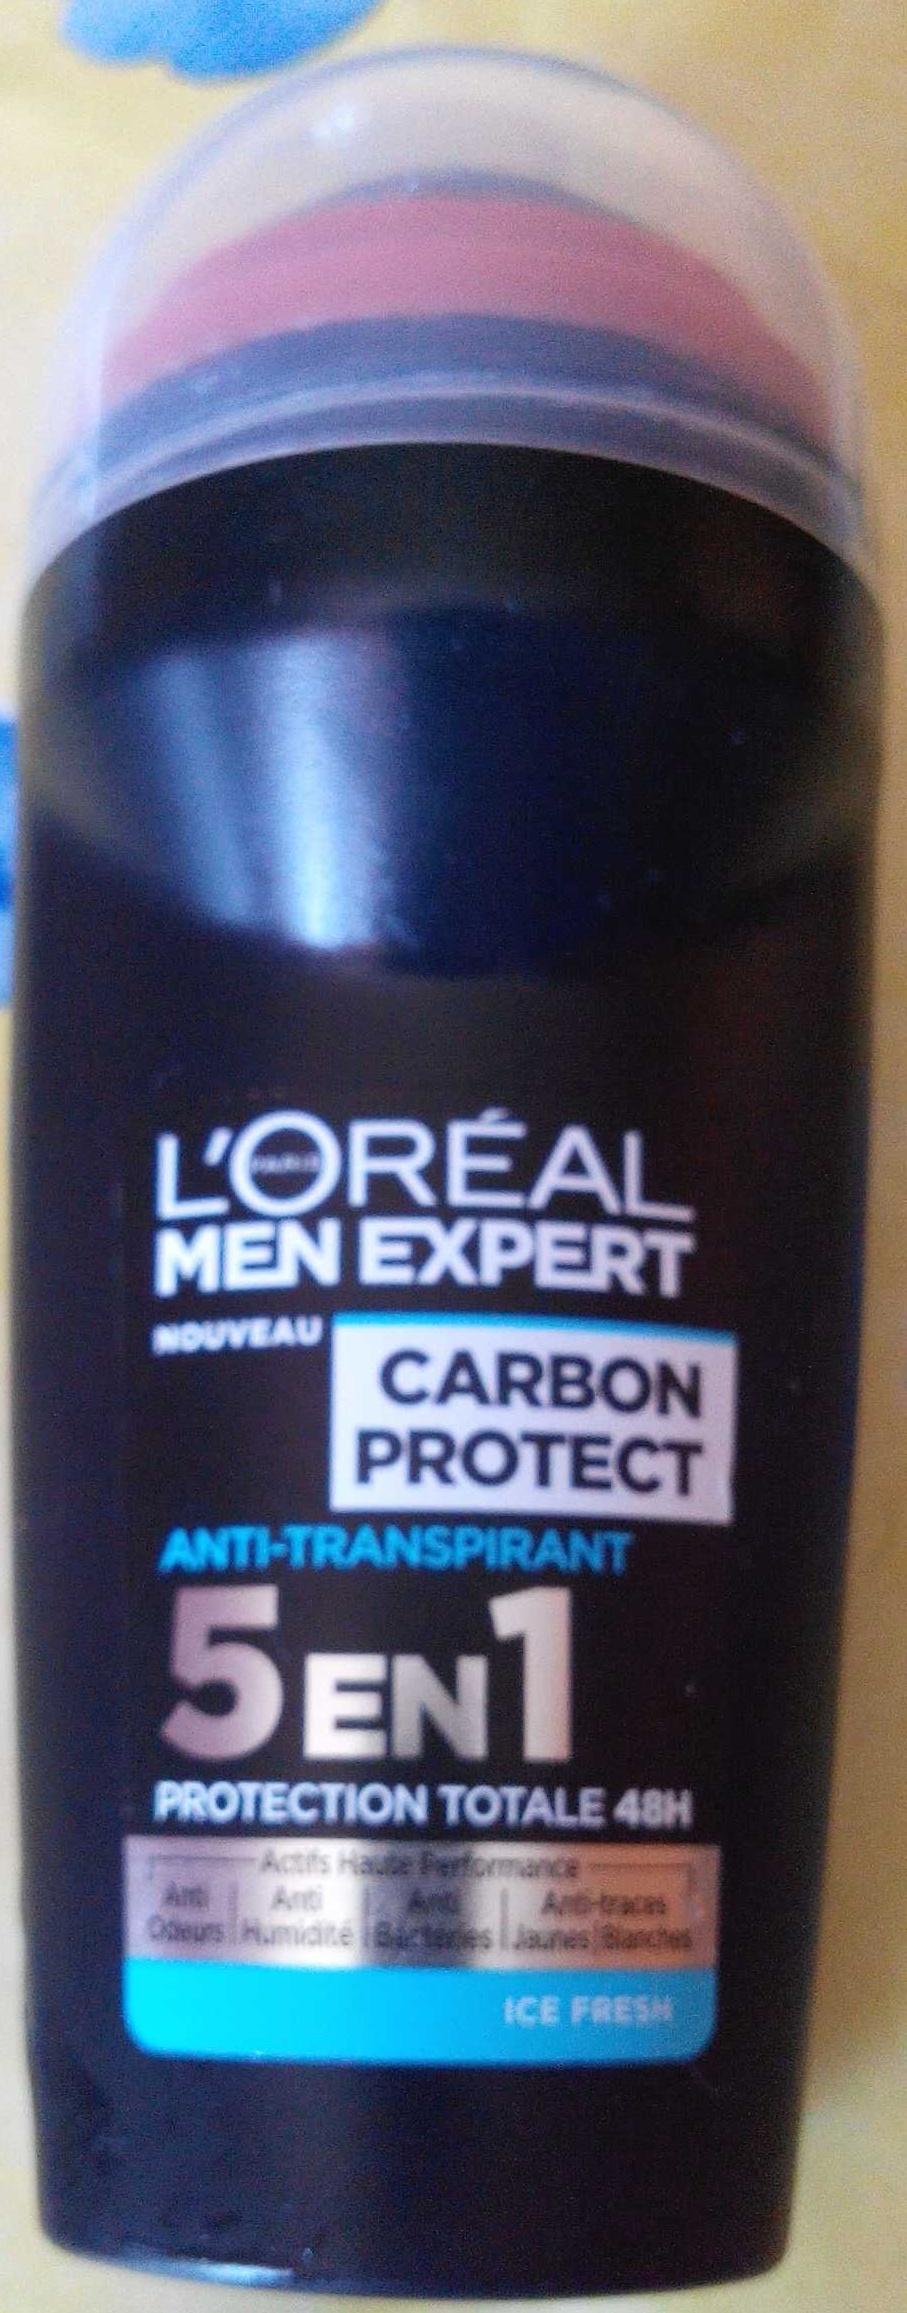 Carbon protect Anti-transpirant 5 en 1 Ice fresh - Produit